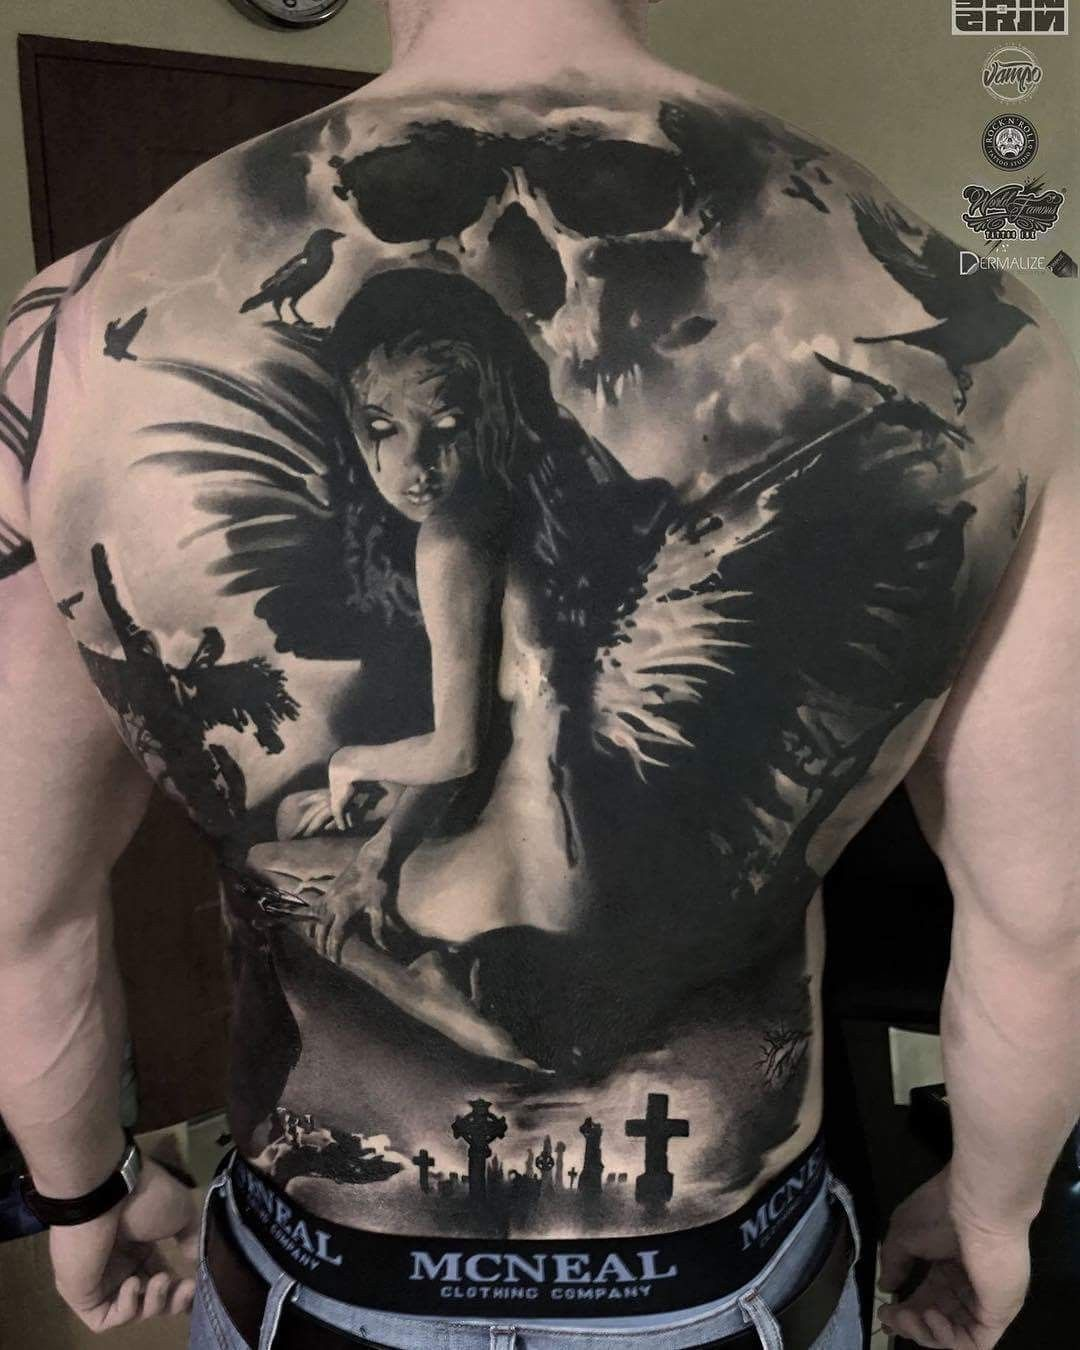 Pin by katherina shanel on favs pinterest tattoo tatoo and tatting